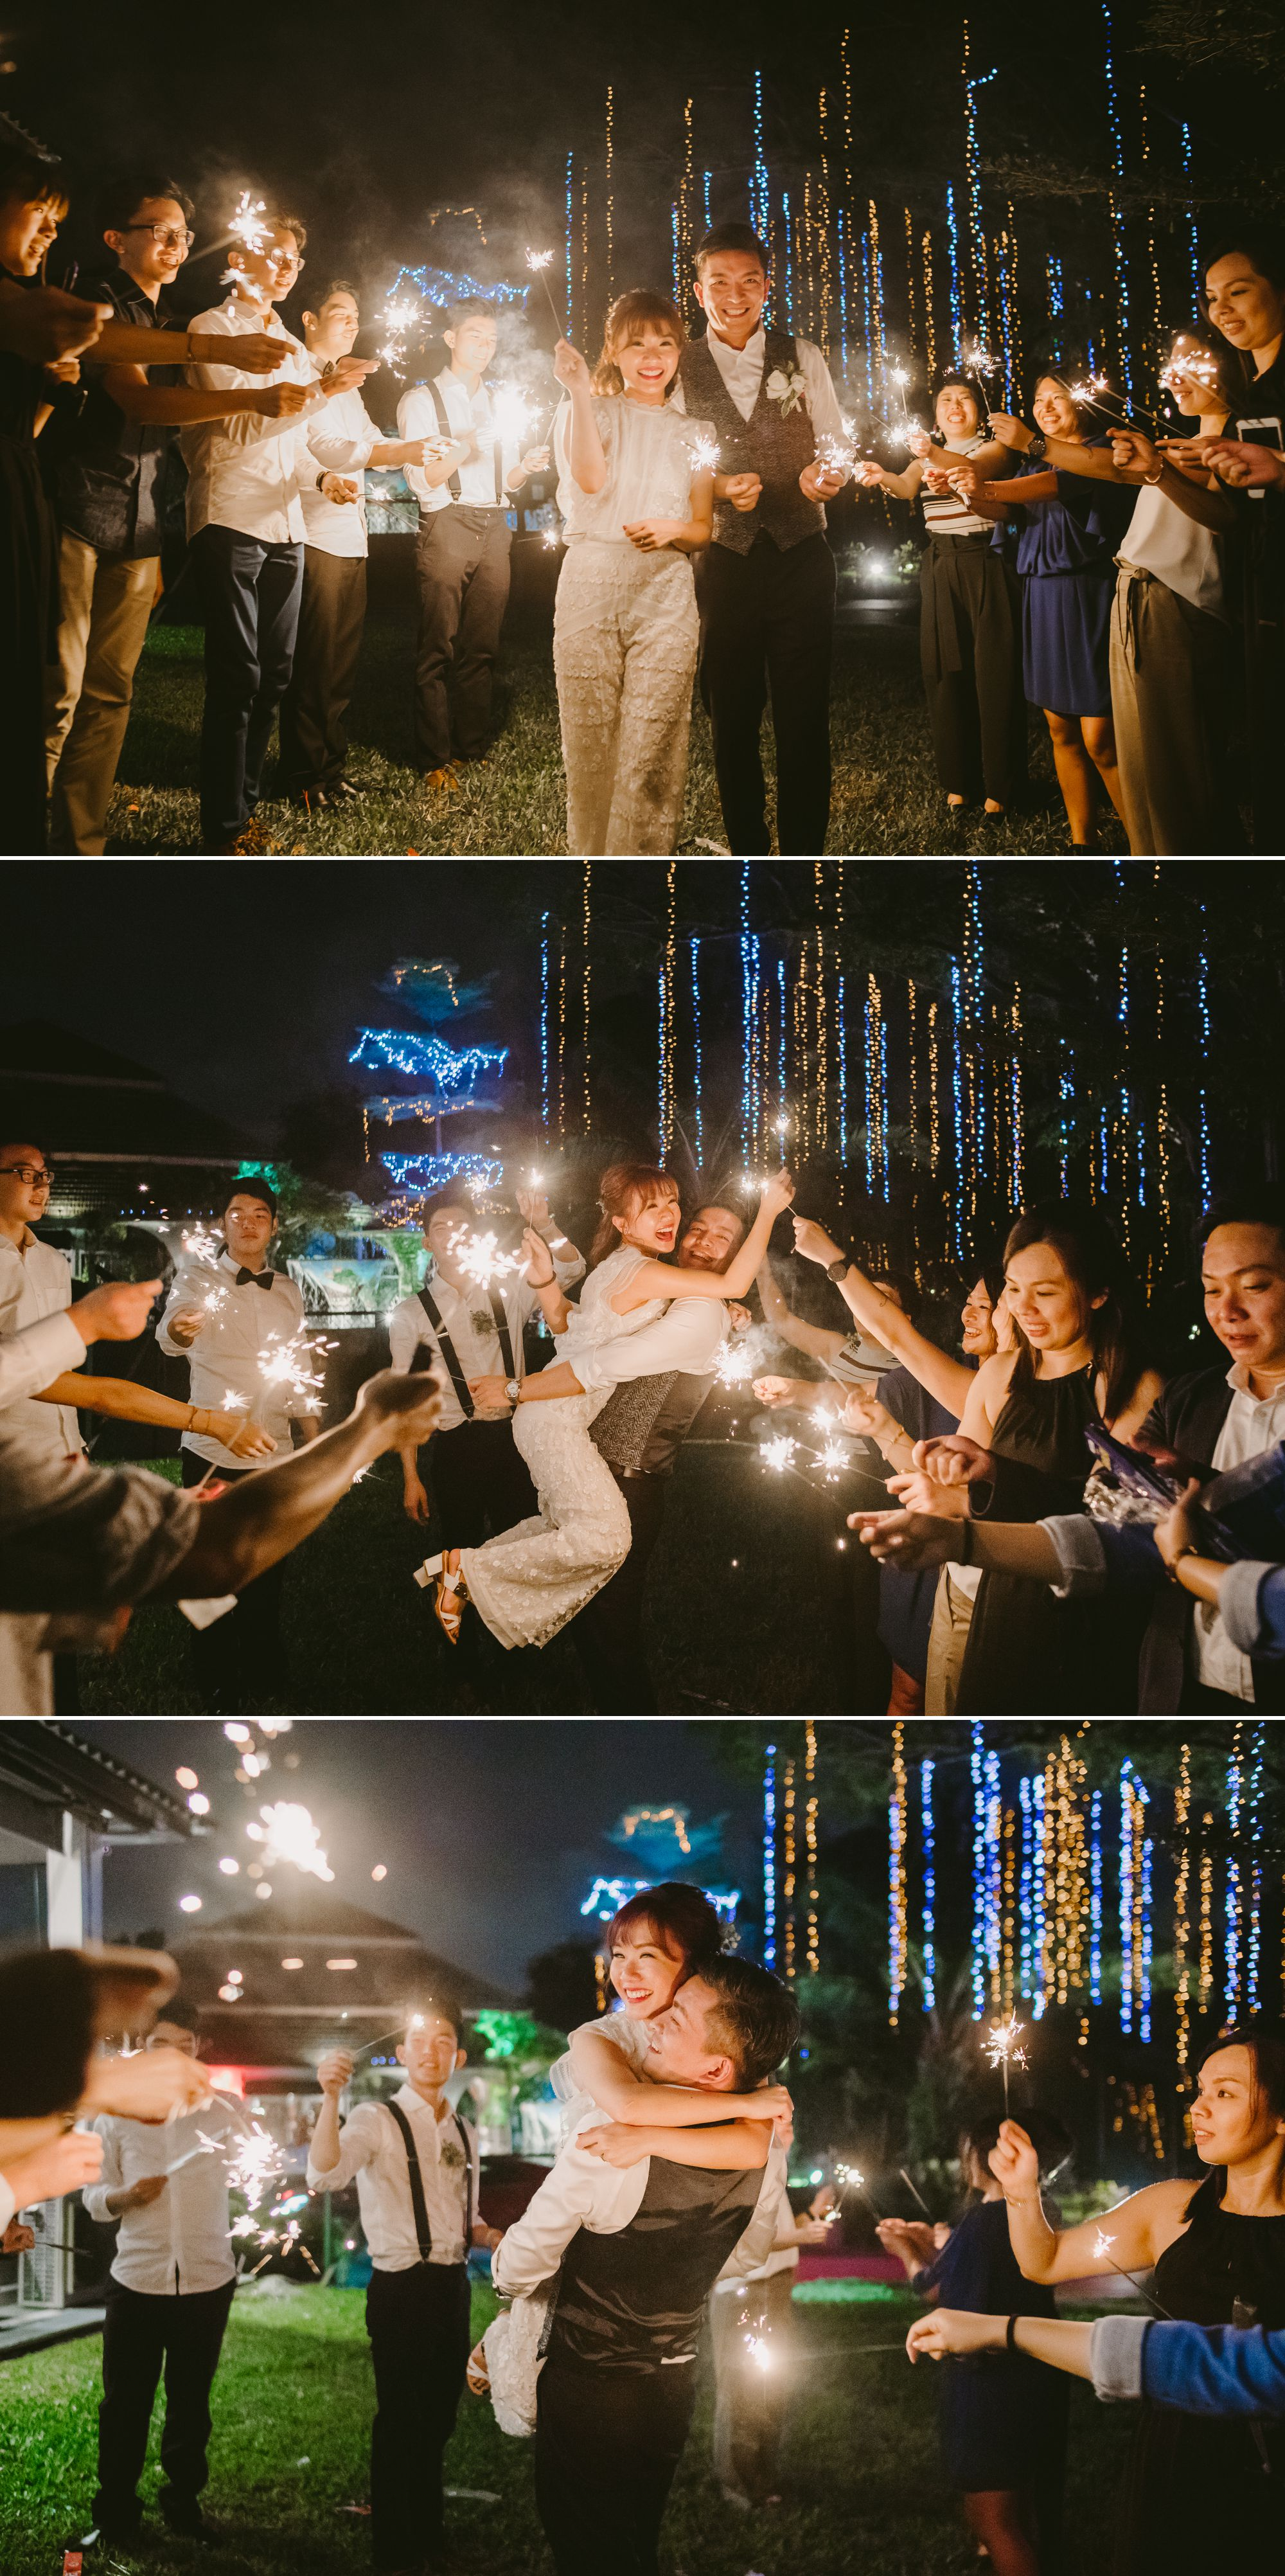 wedding_photography 41.jpg